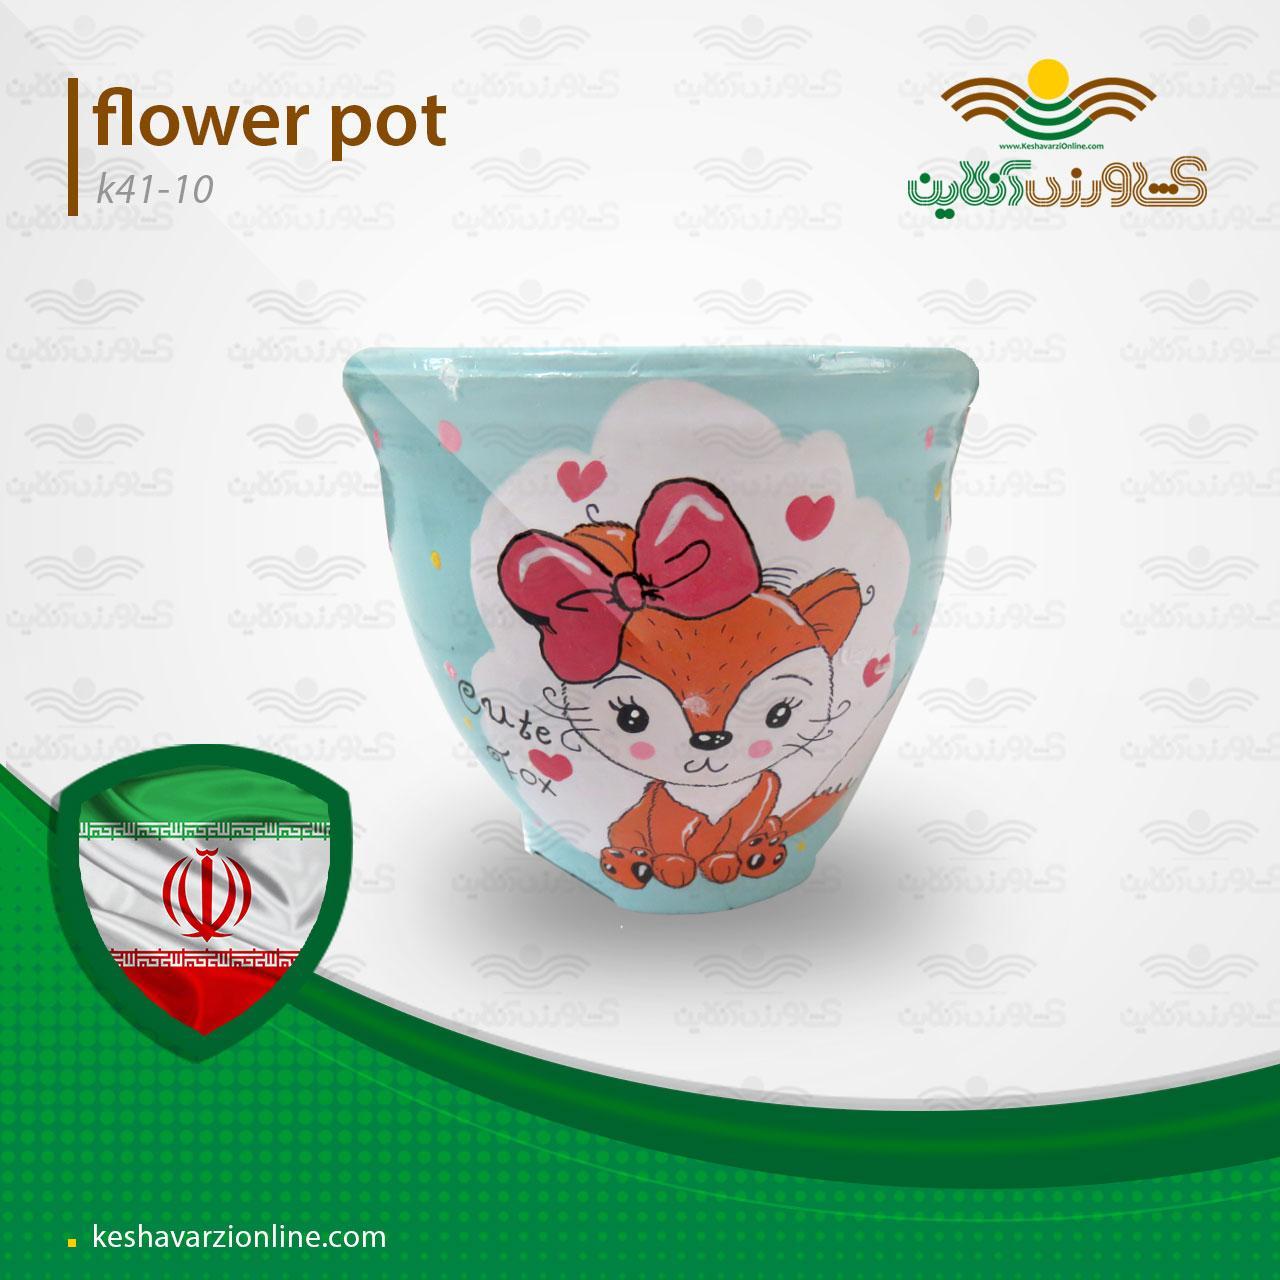 گلدان دکوری K41.10